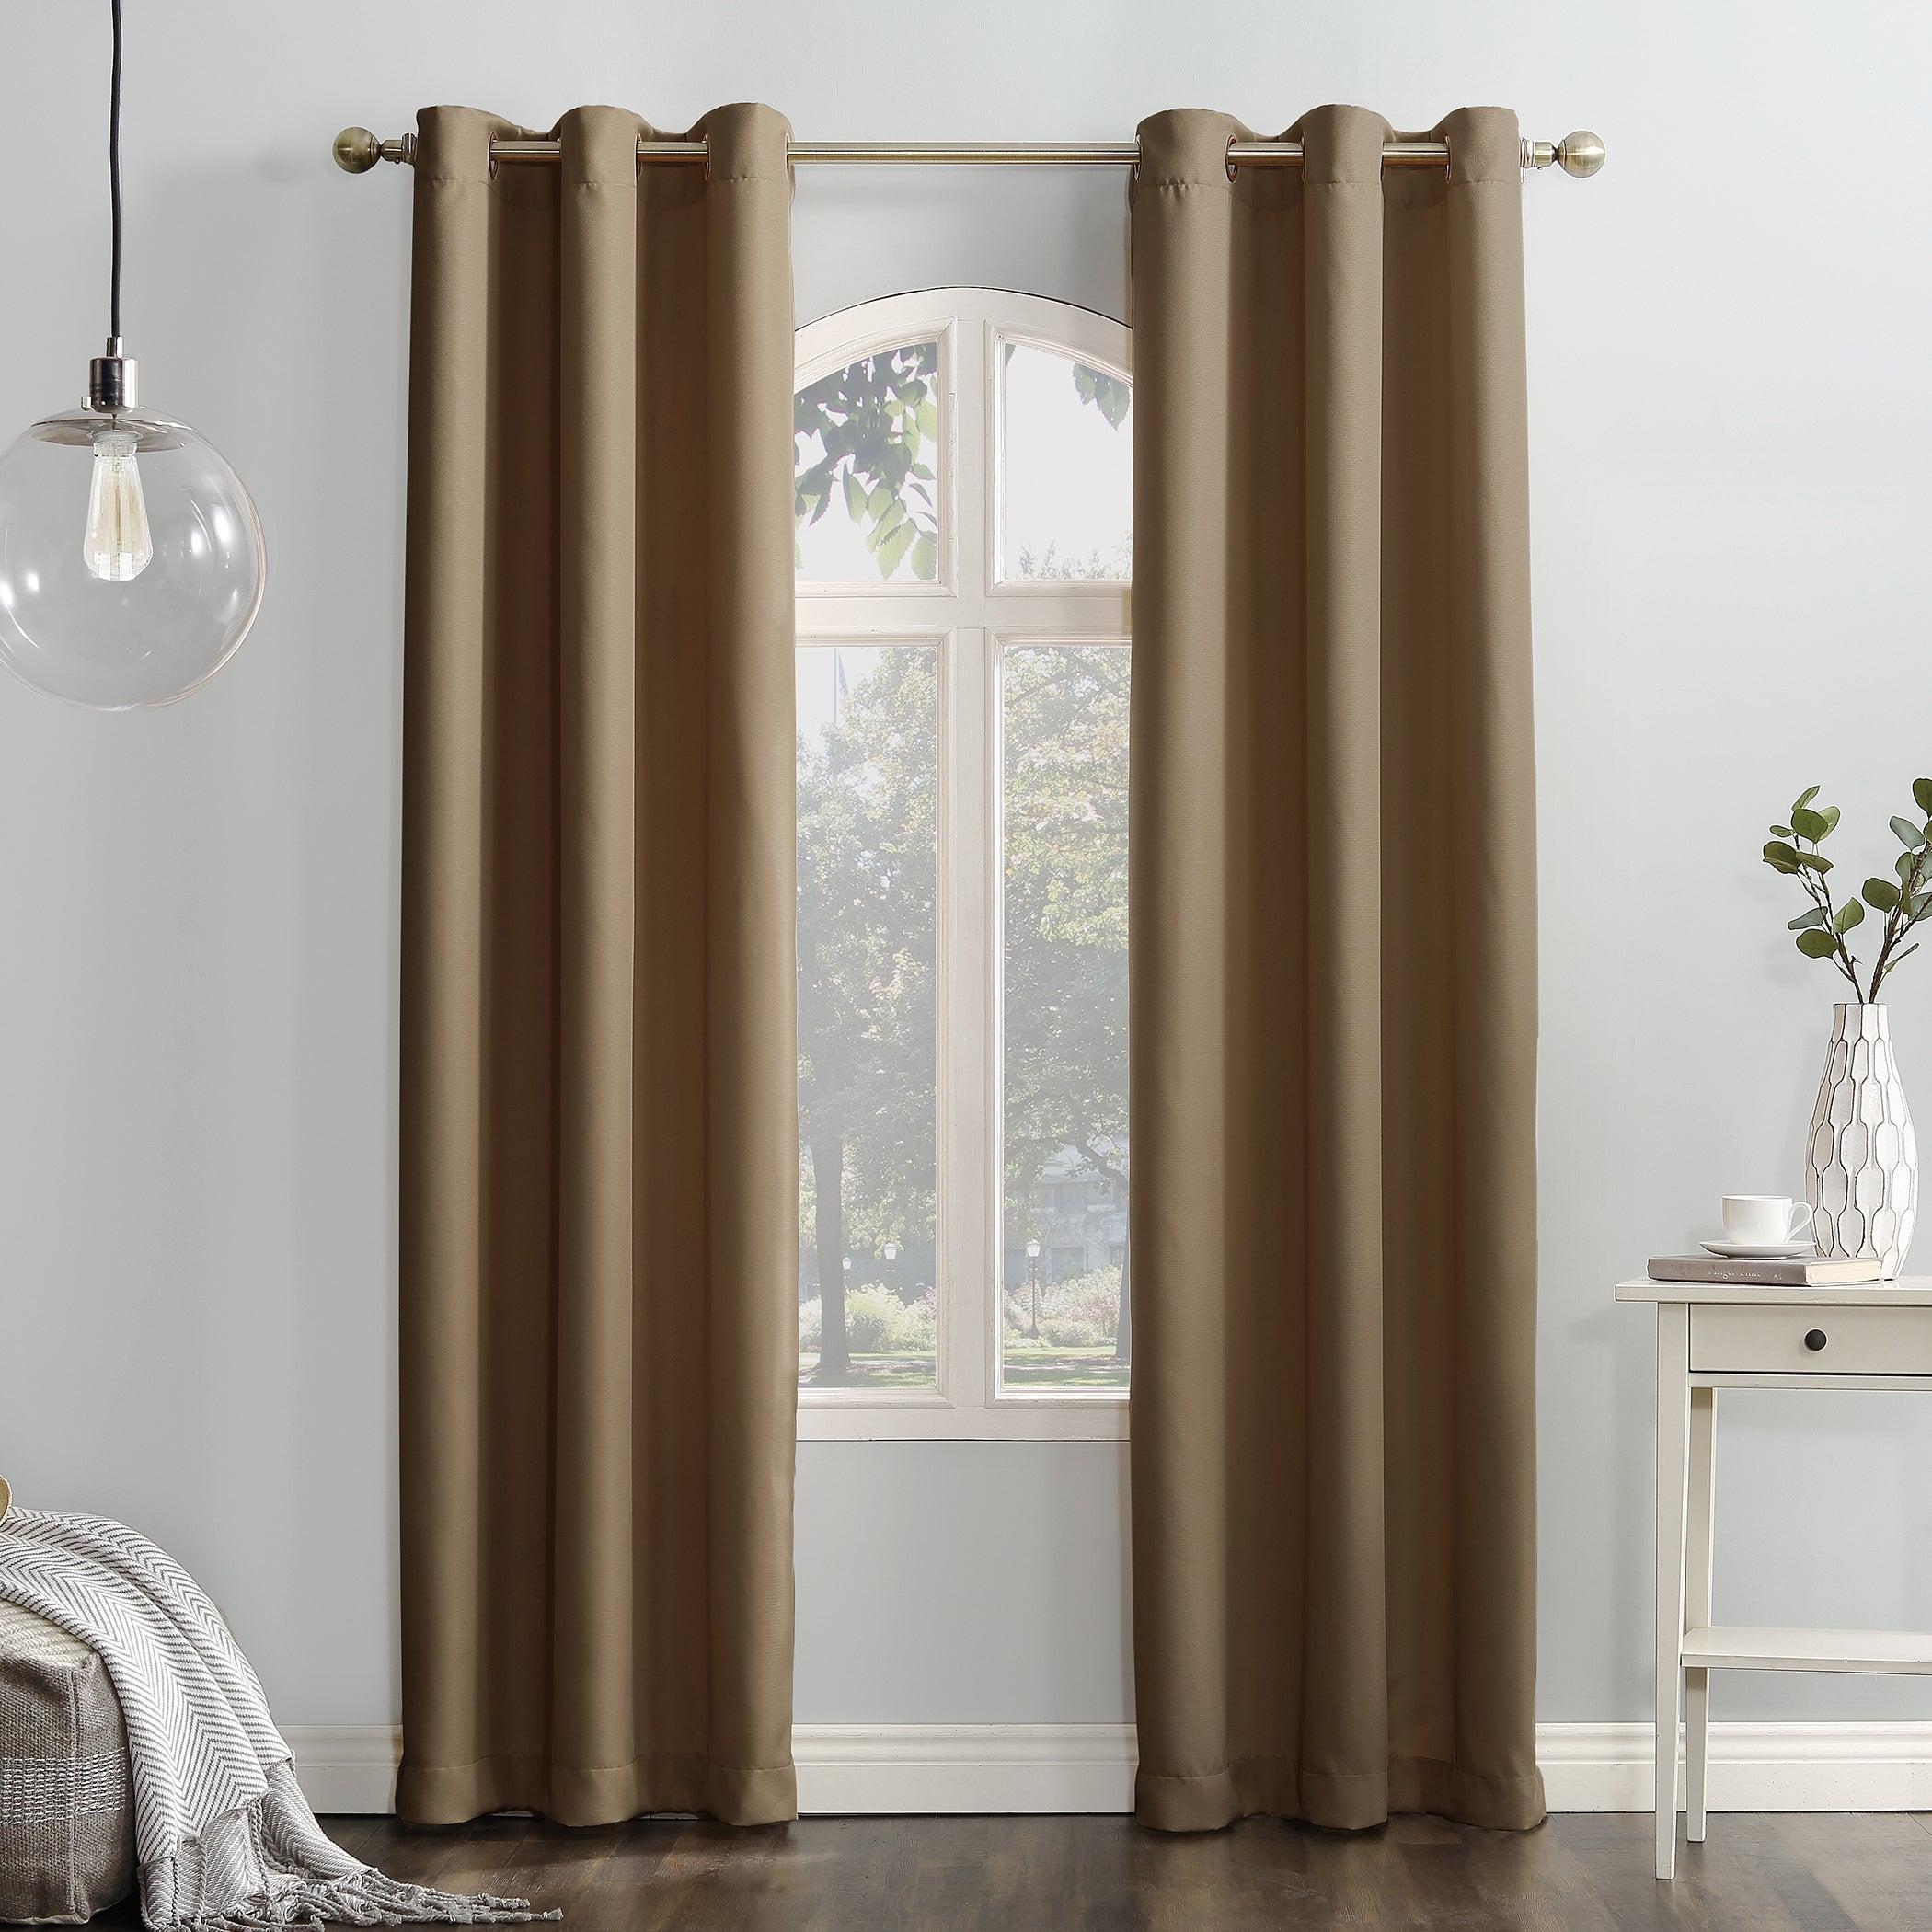 Shop Copper Grove Speedwell Grommet Window Curtain Panel With Regard To Copper Grove Speedwell Grommet Window Curtain Panels (View 2 of 20)